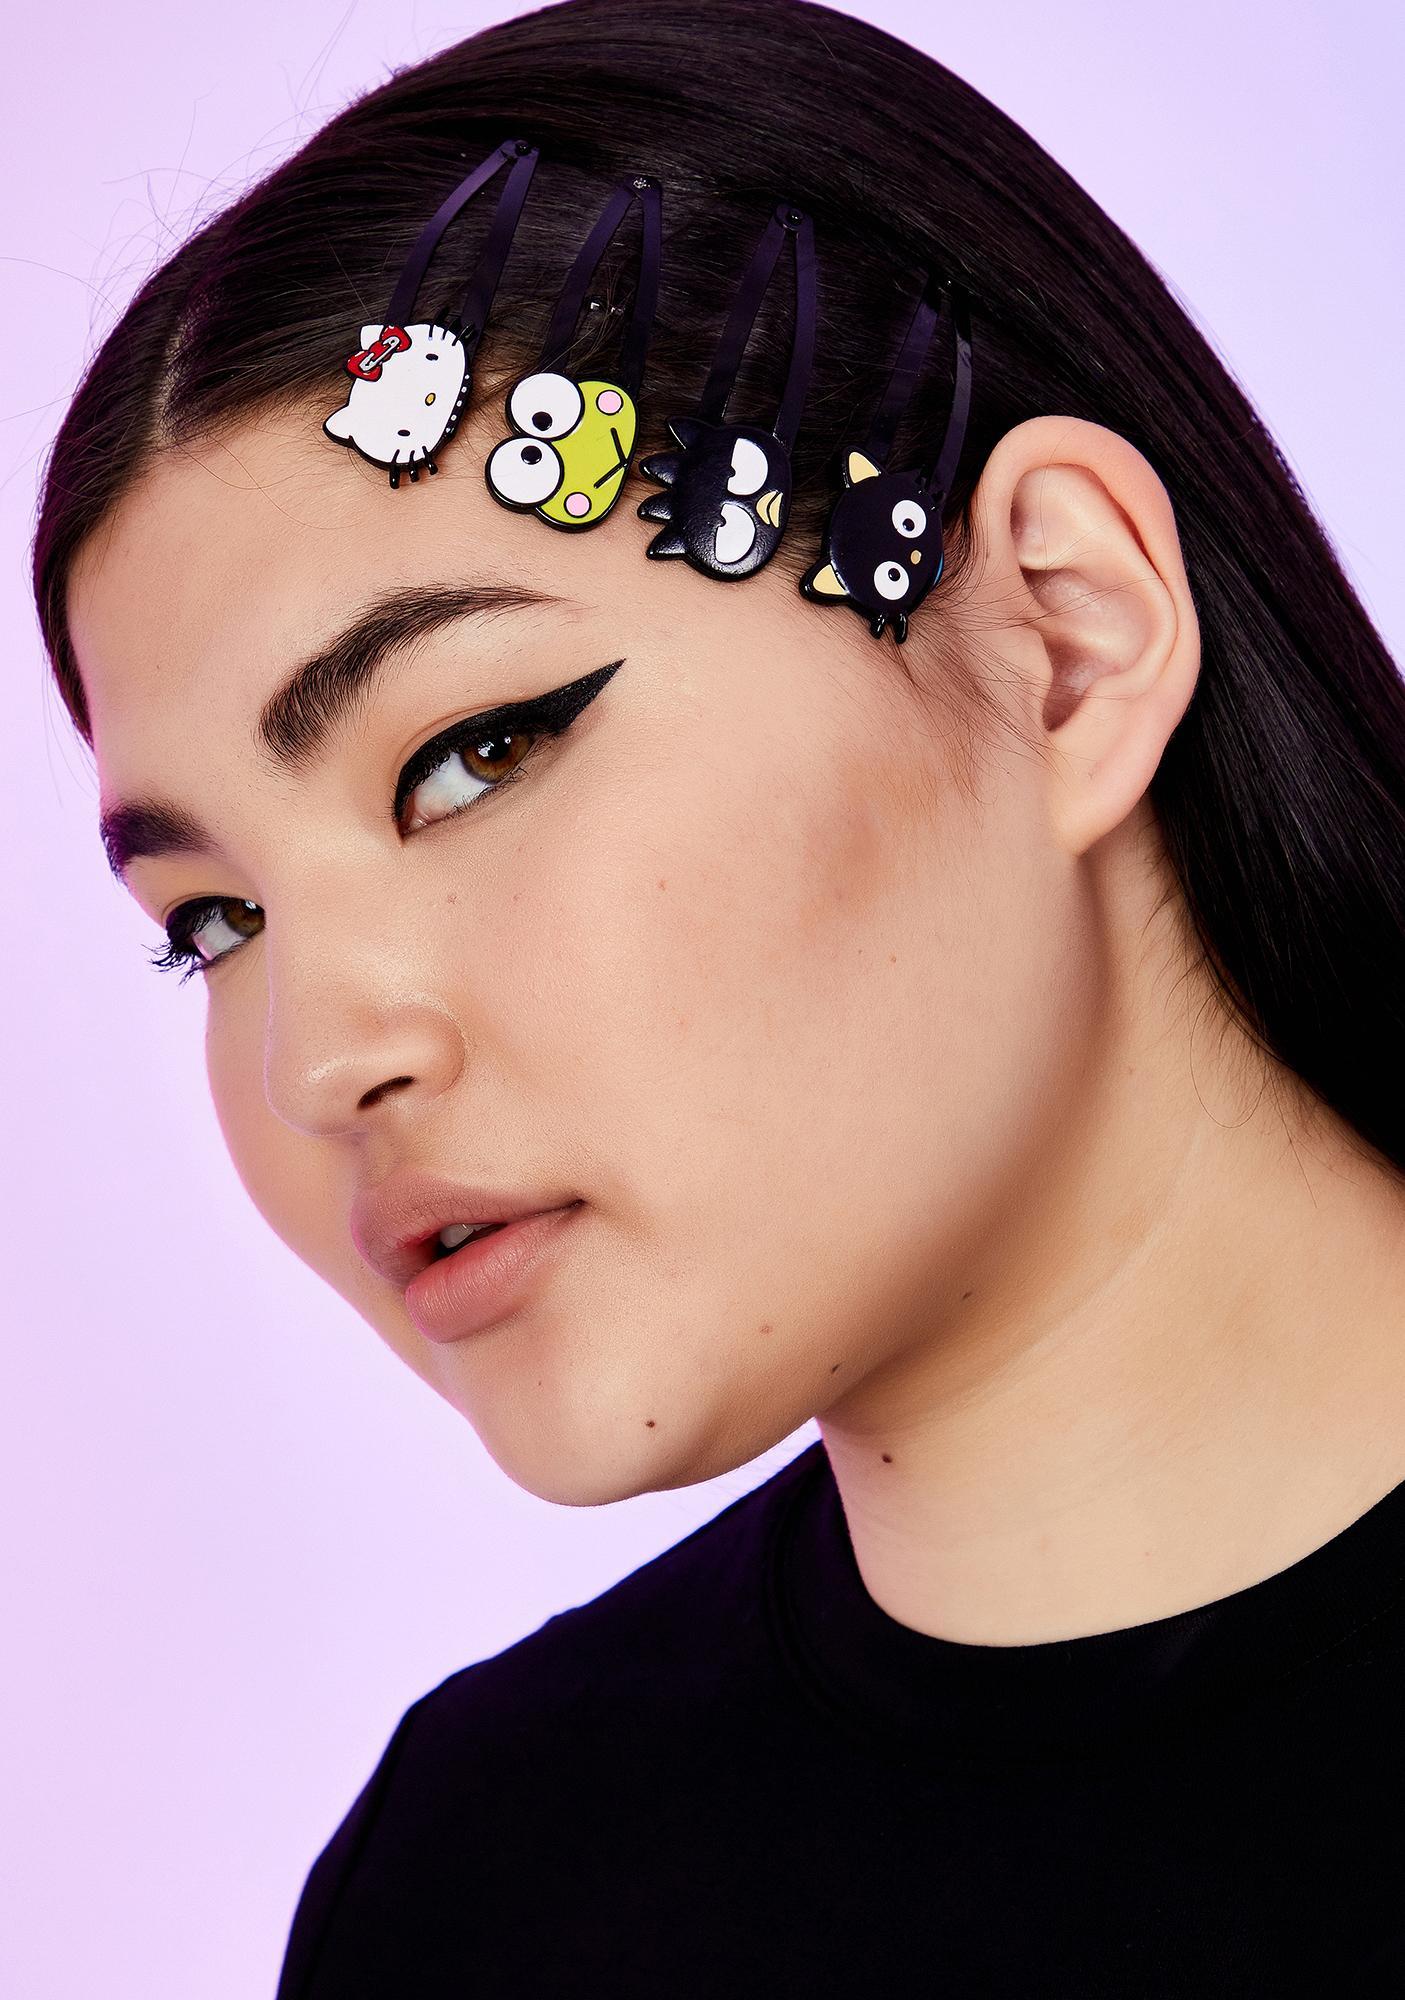 Dolls Kill x Hello Kitty Besties In Arms Hair Clip Set